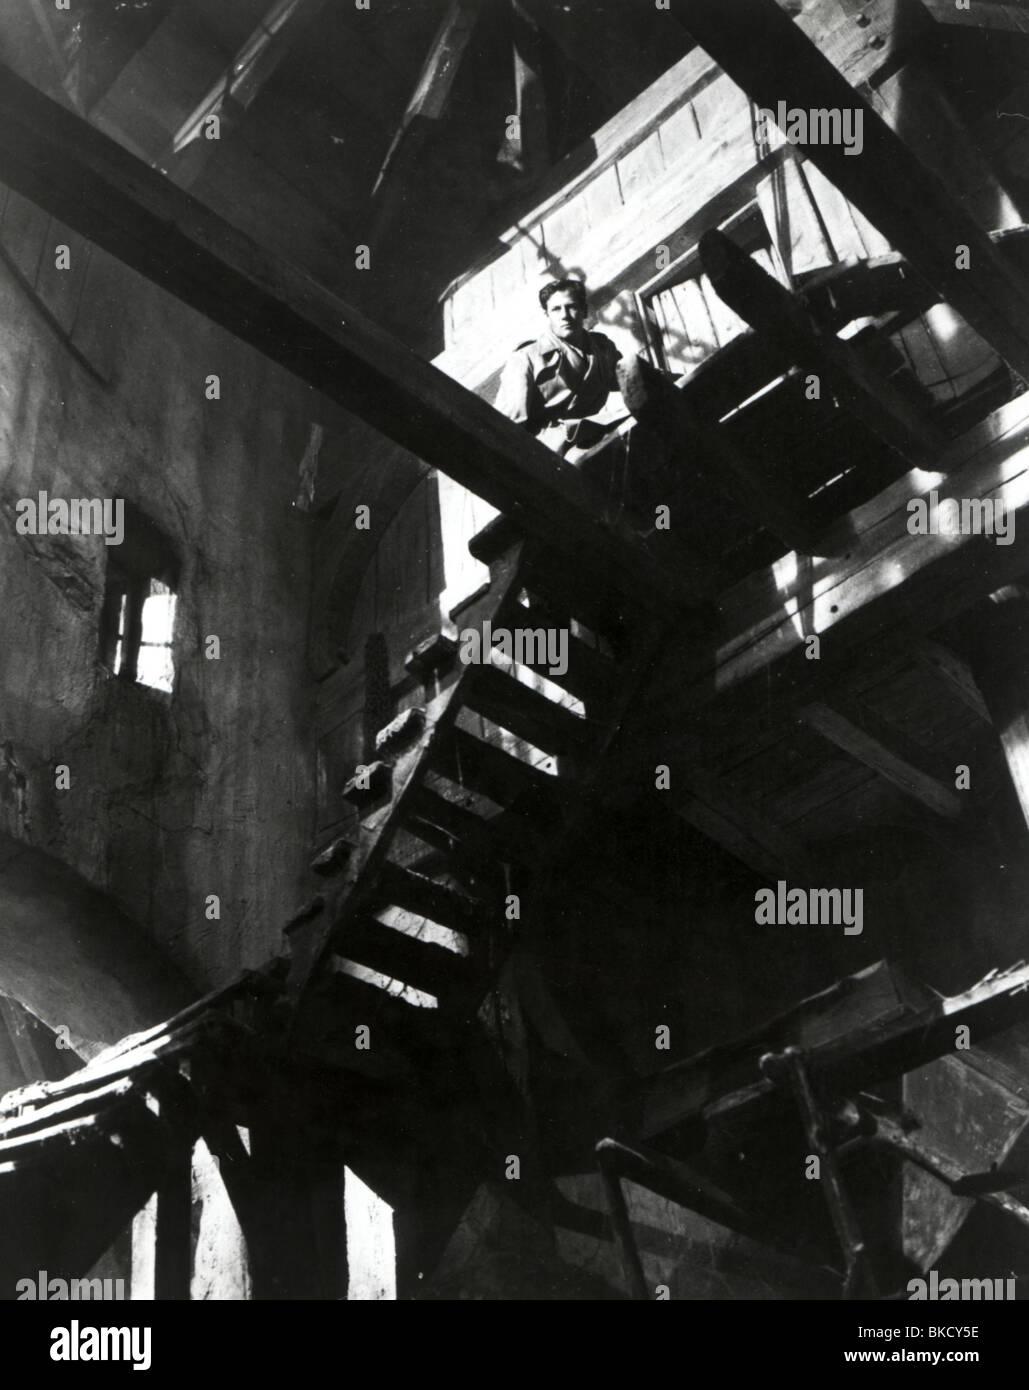 FOREIGN CORRESPONDENT (1940) JOEL MCCREA FRCS 002P Stock Photo